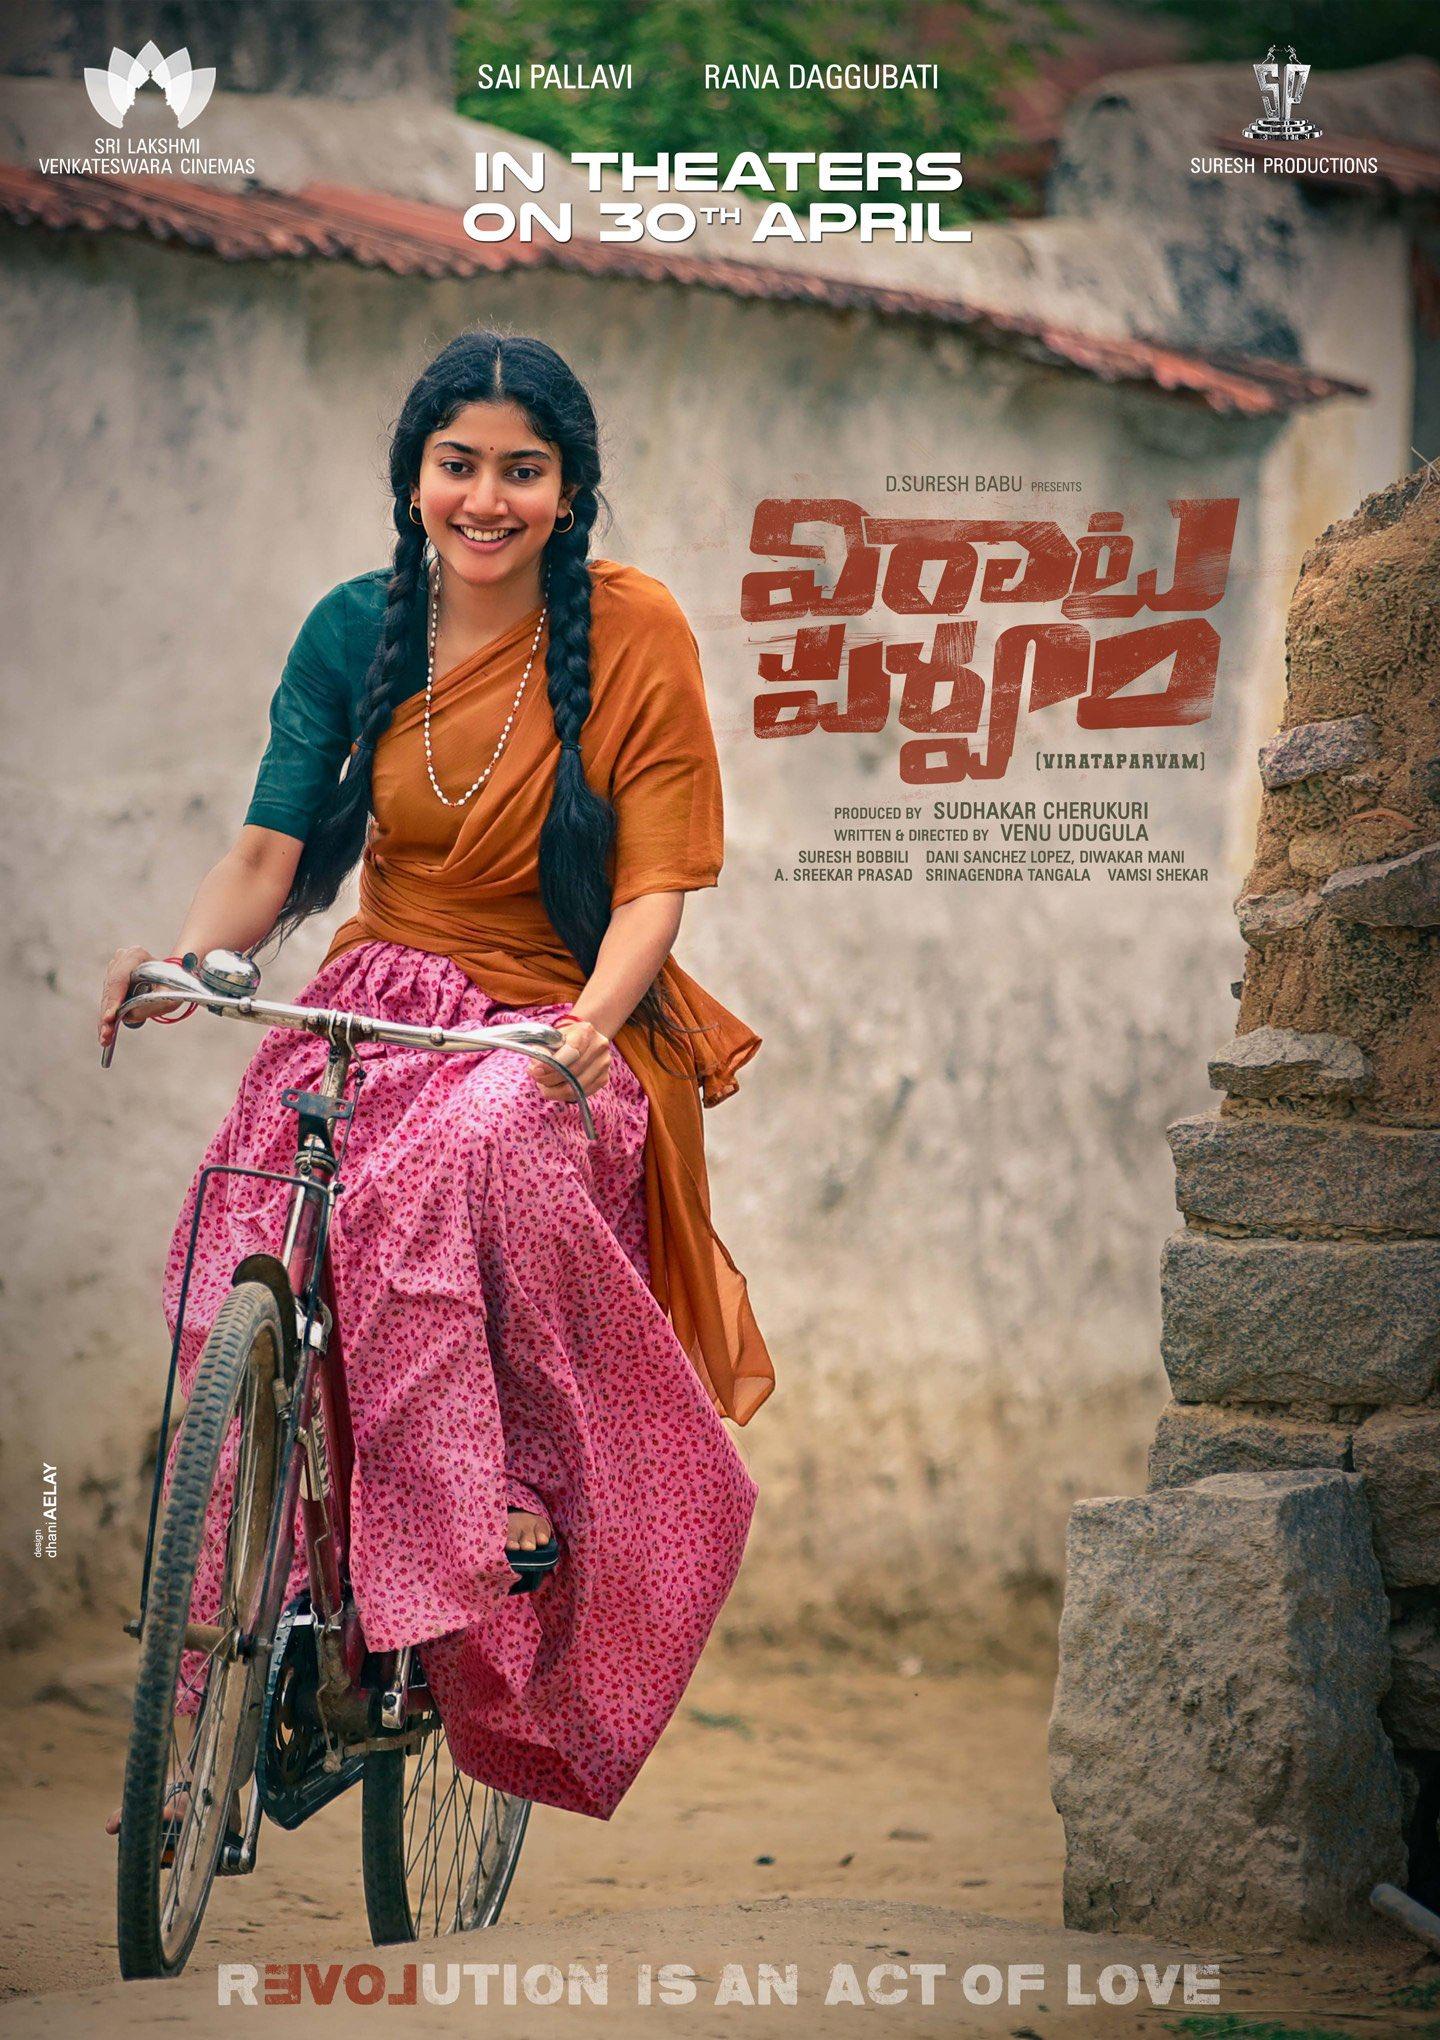 Sai Pallavi Virata Parvam Movie Releasing April 30th